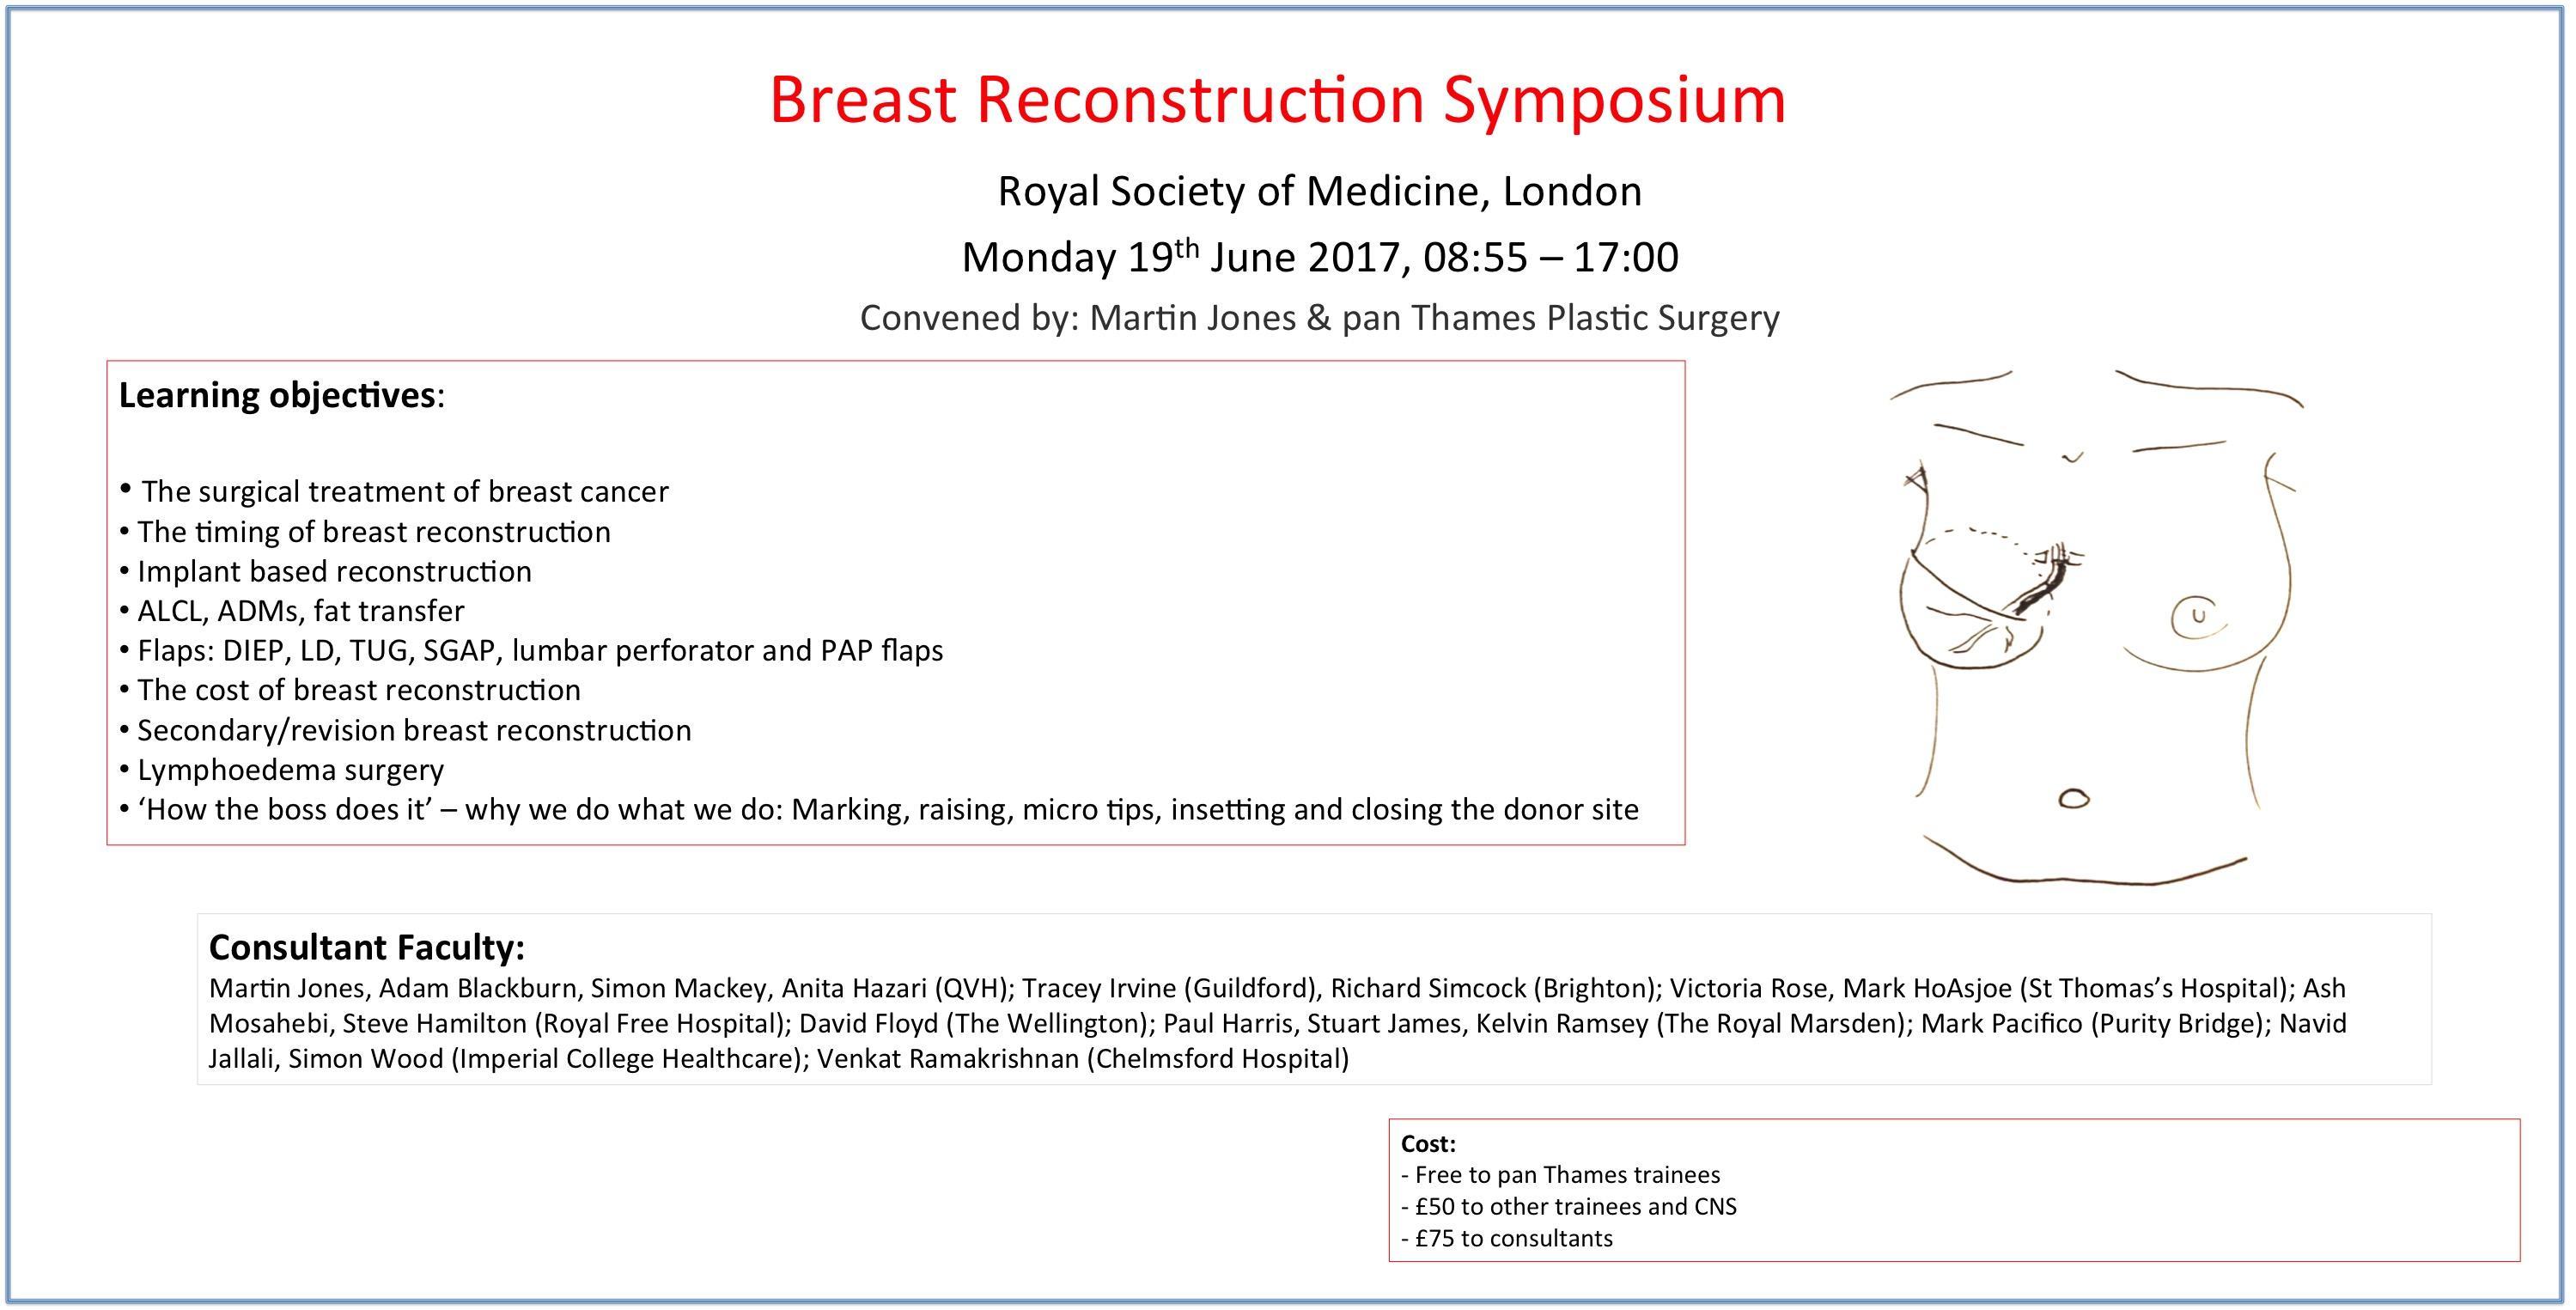 Breast Reconstruction Symposium